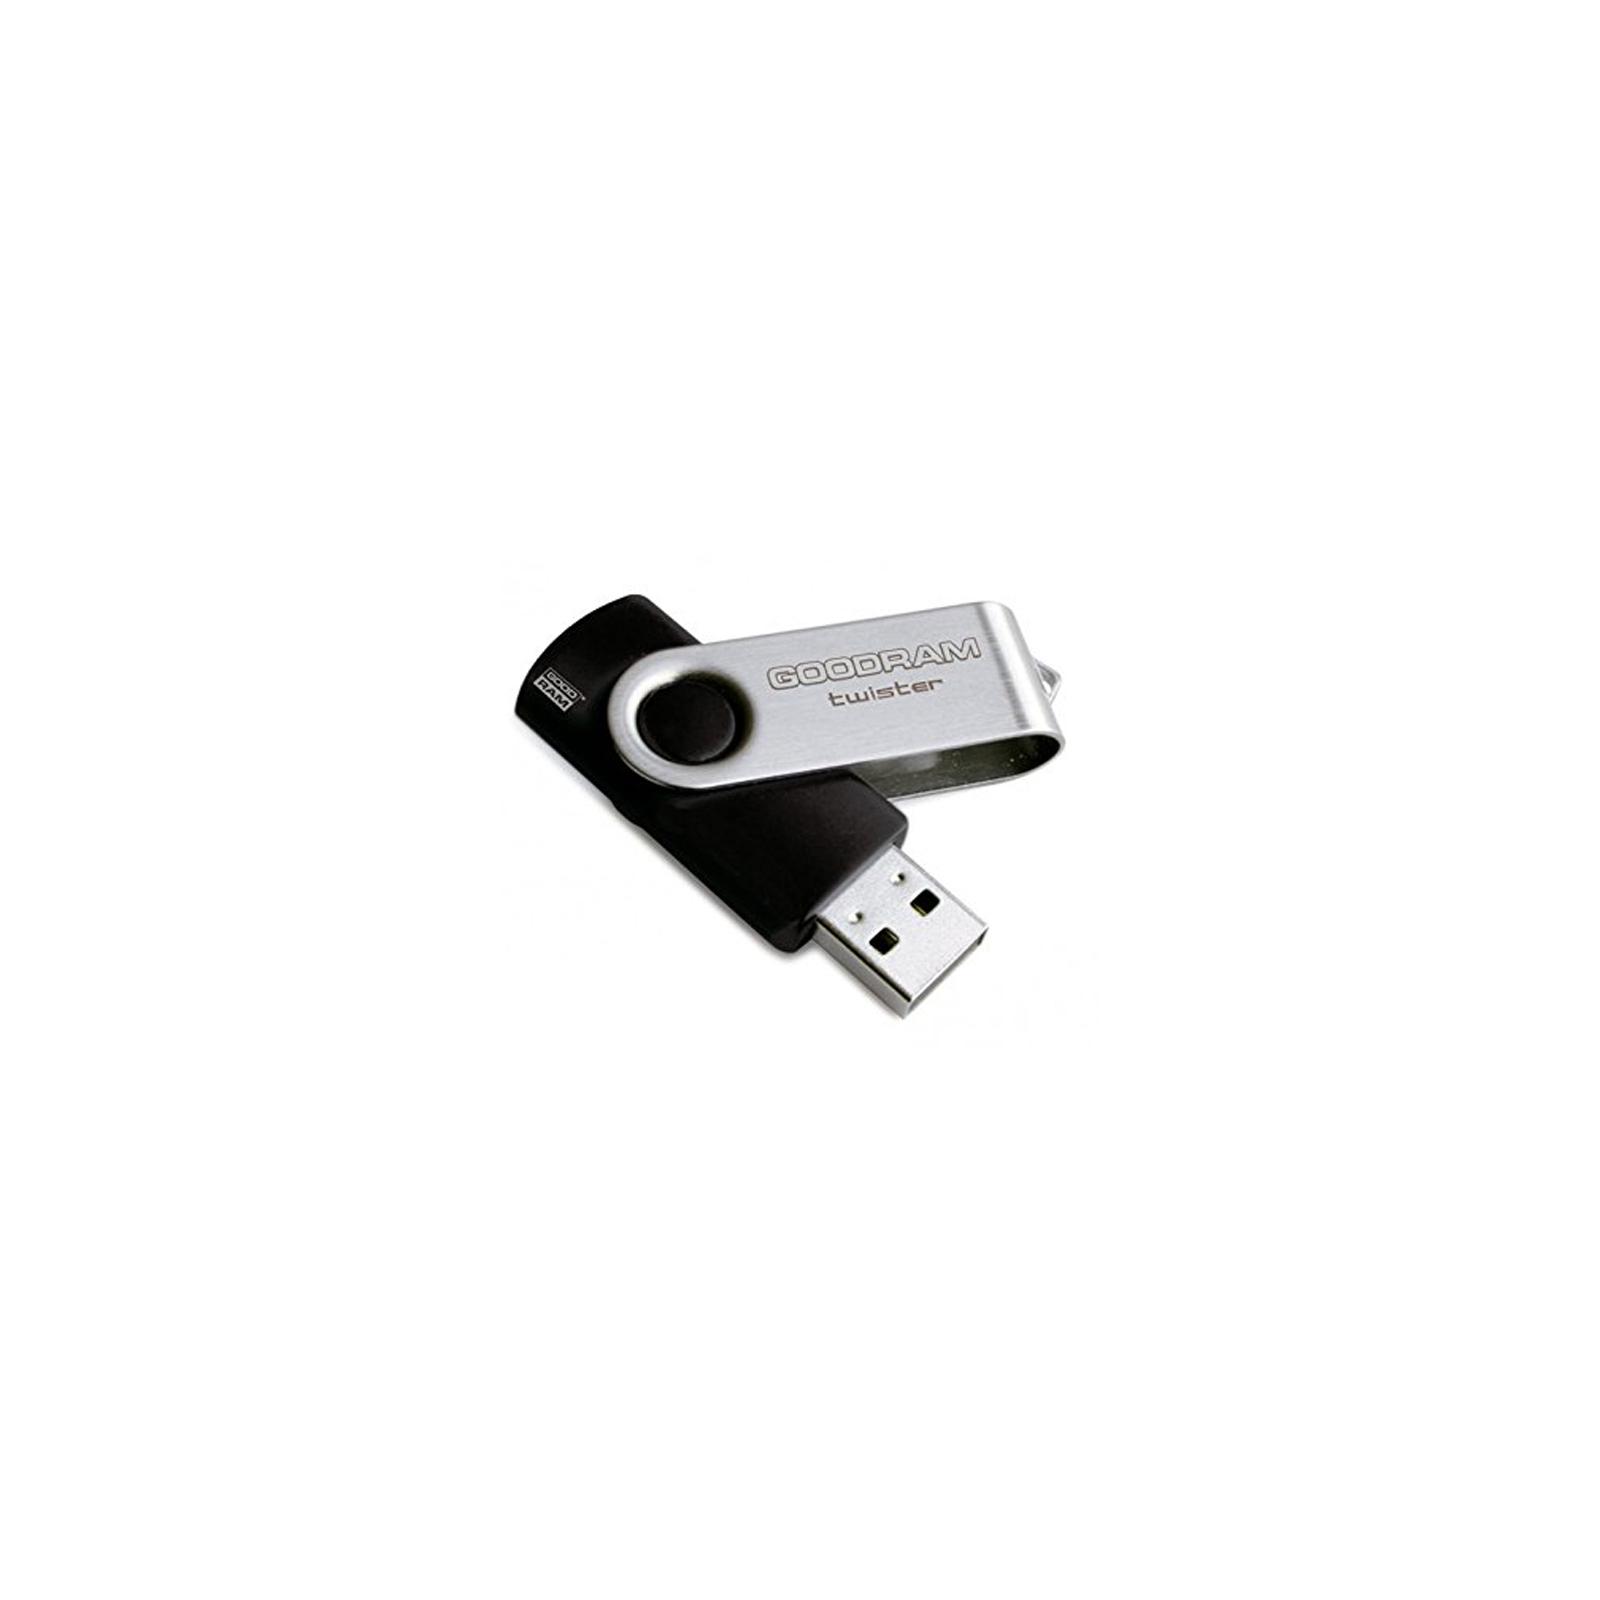 USB флеш накопитель GOODRAM 8GB Twister Black USB 2.0 (UTS2-0080K0R11) изображение 2